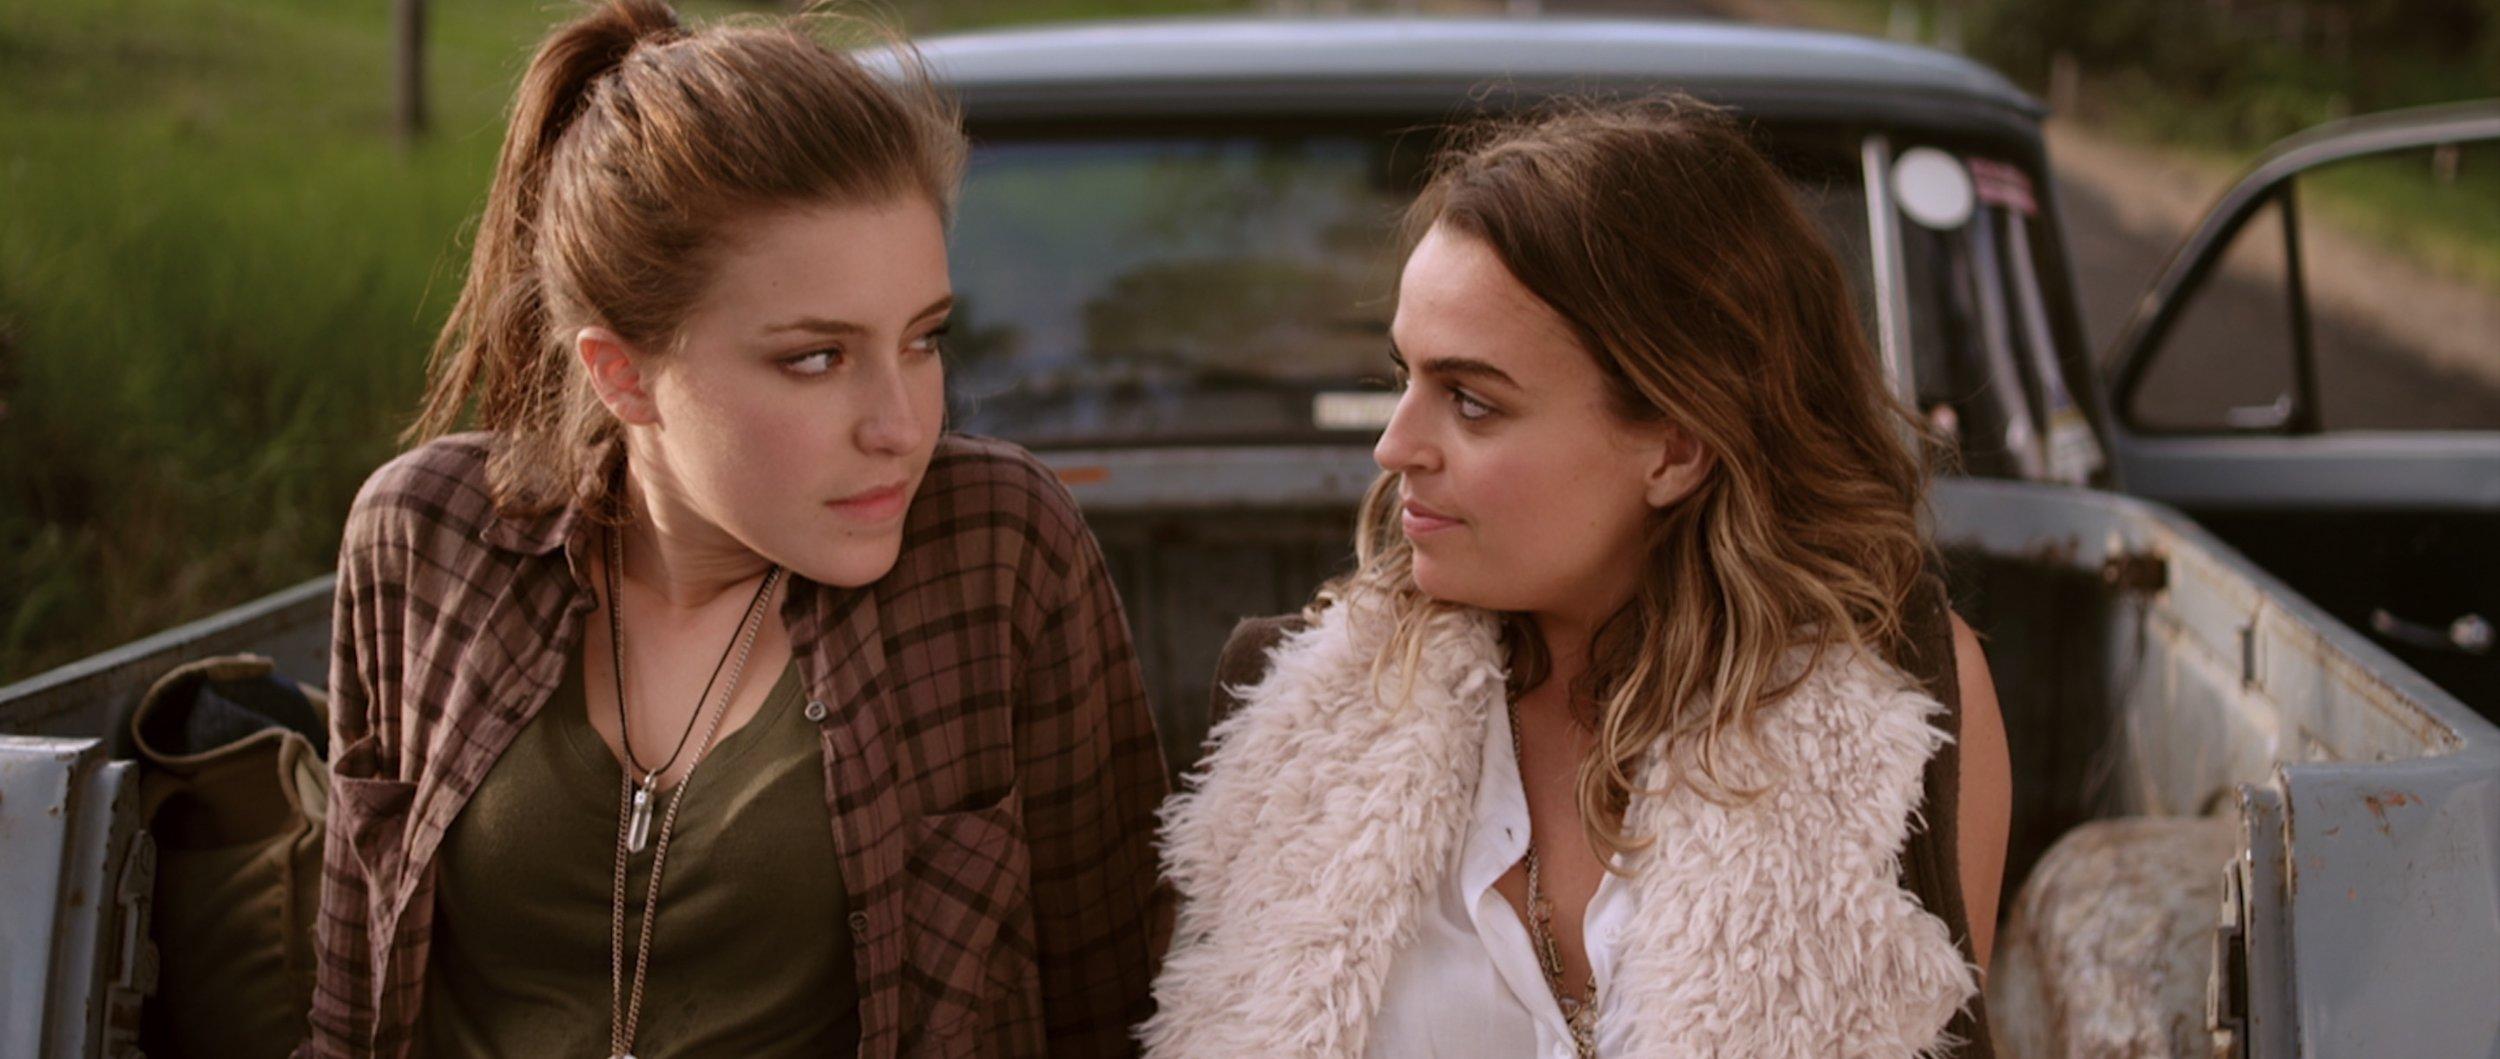 Kate Halpin Director Film - A Private Matter - Bianca Bradey 5